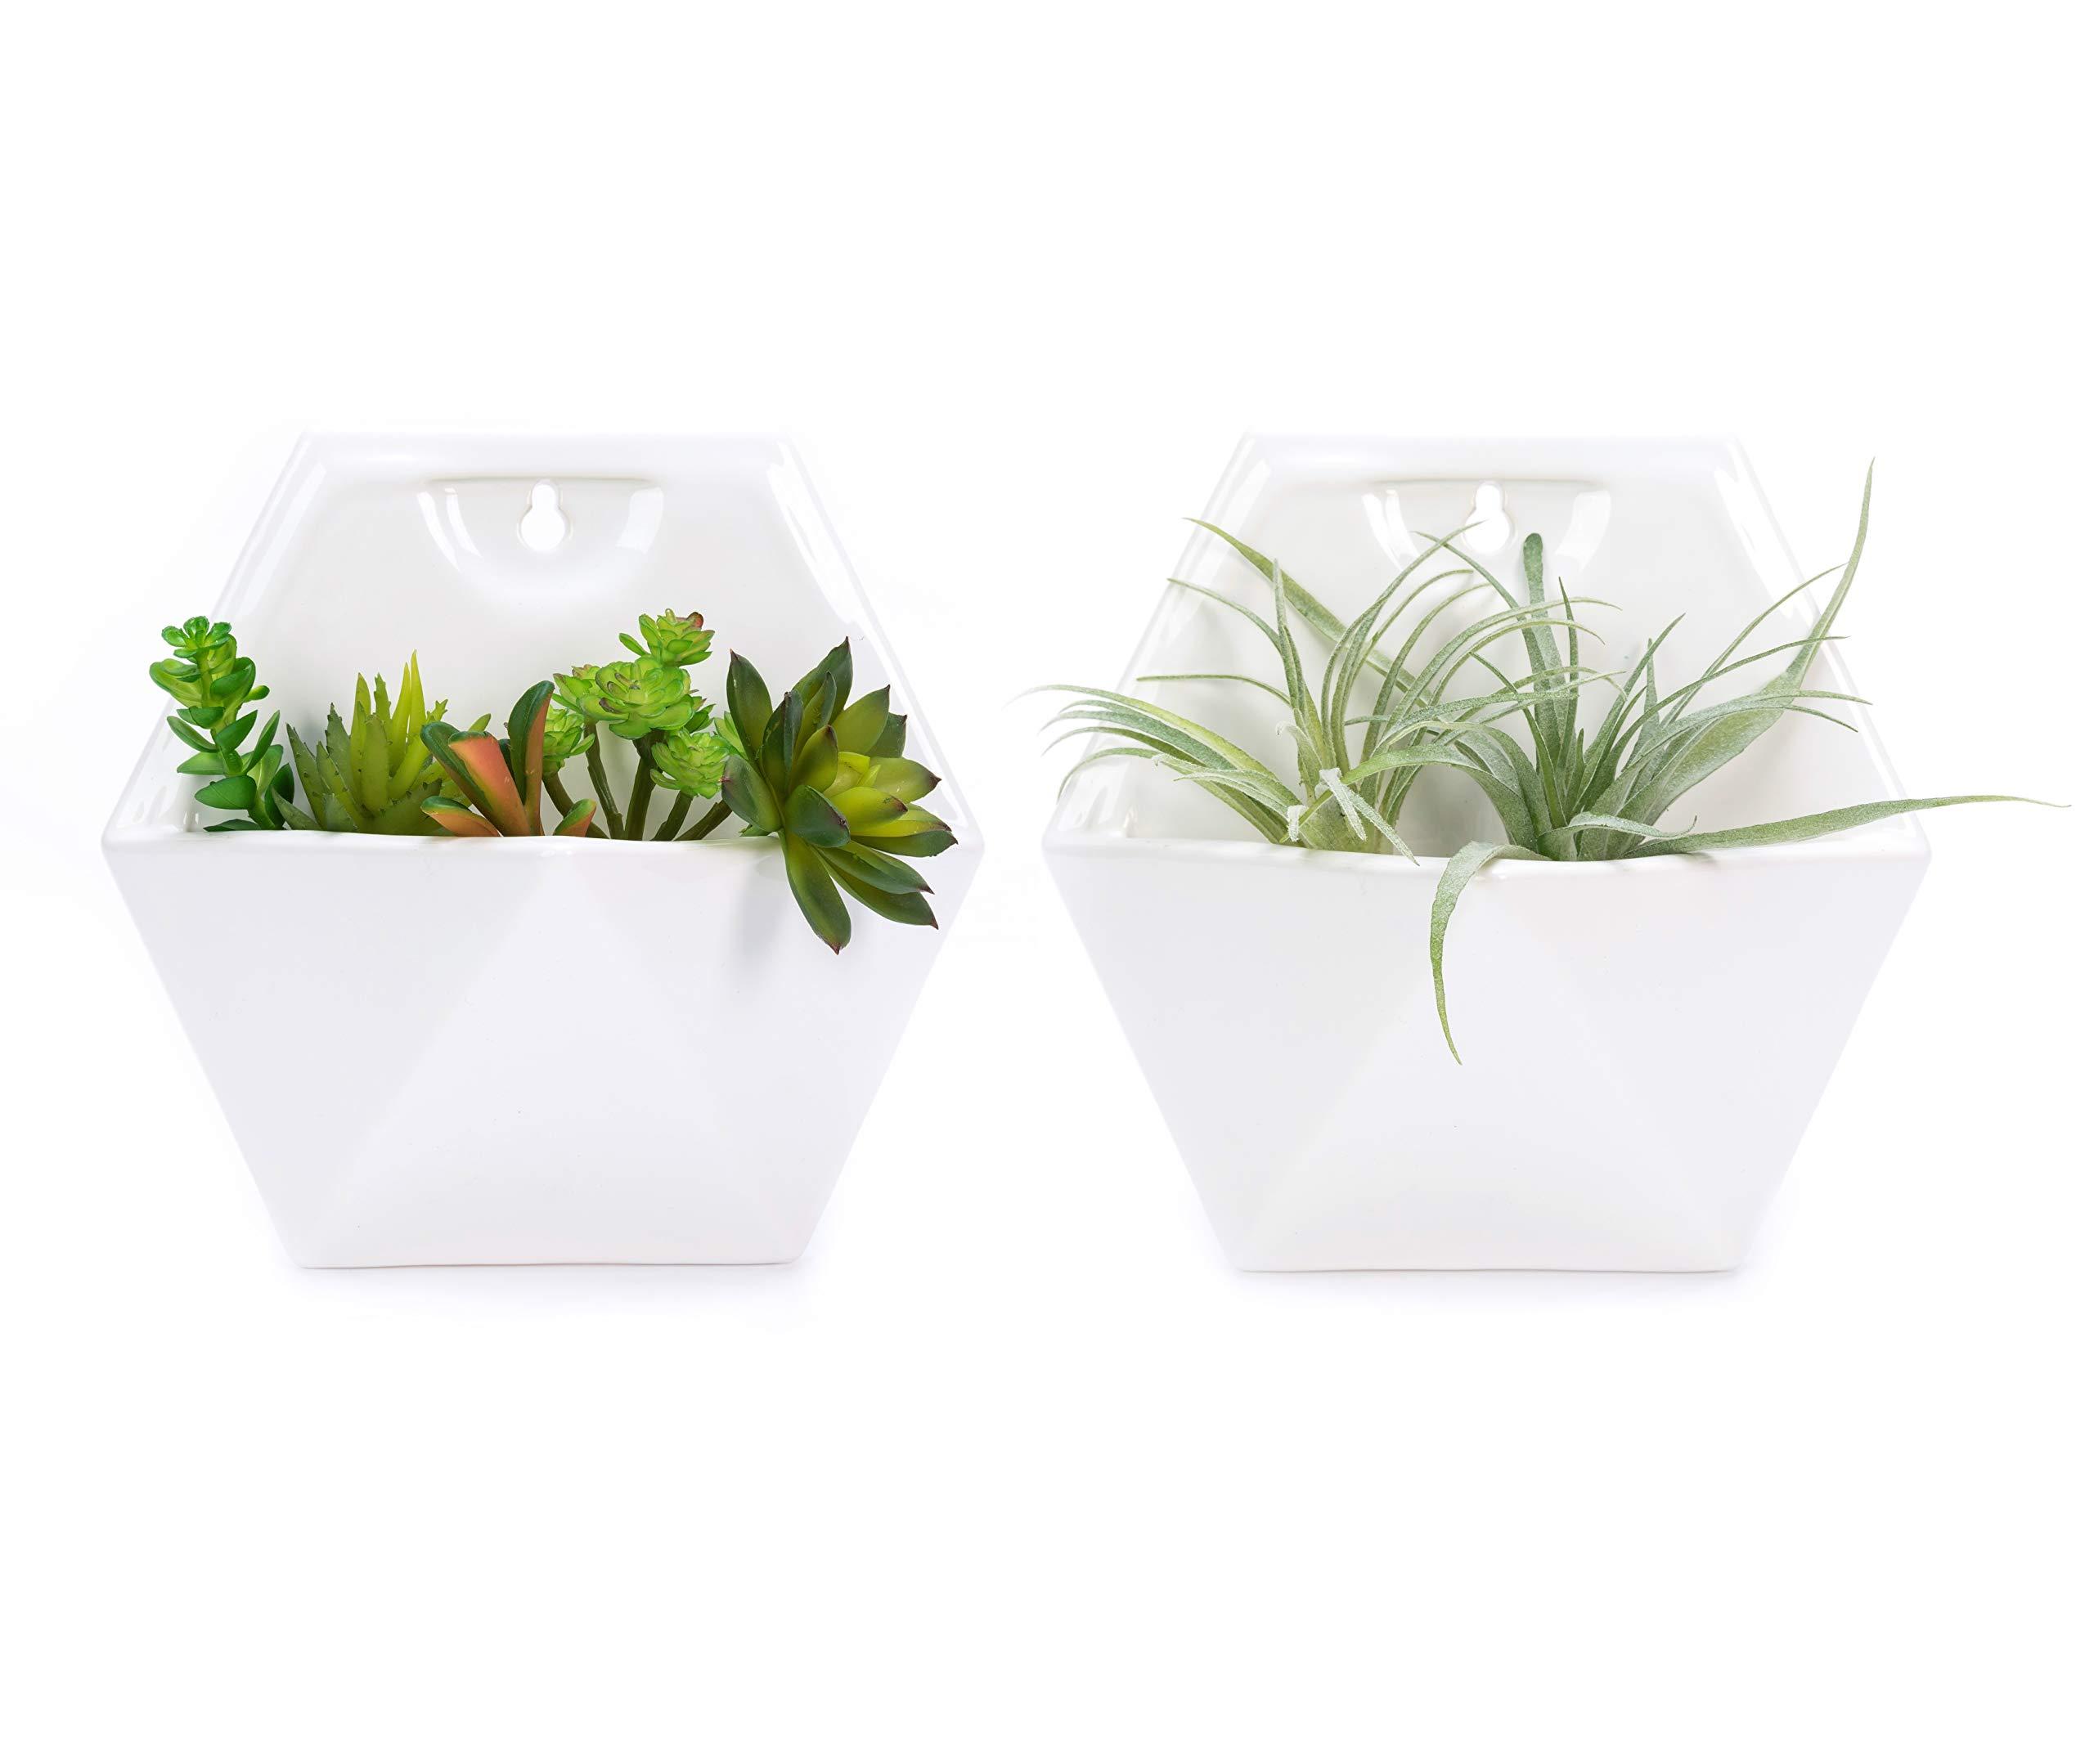 Nattol Wall Succulent Planter, White Ceramic Planters | Geometric Succulent Planters, Set of 2 (White)